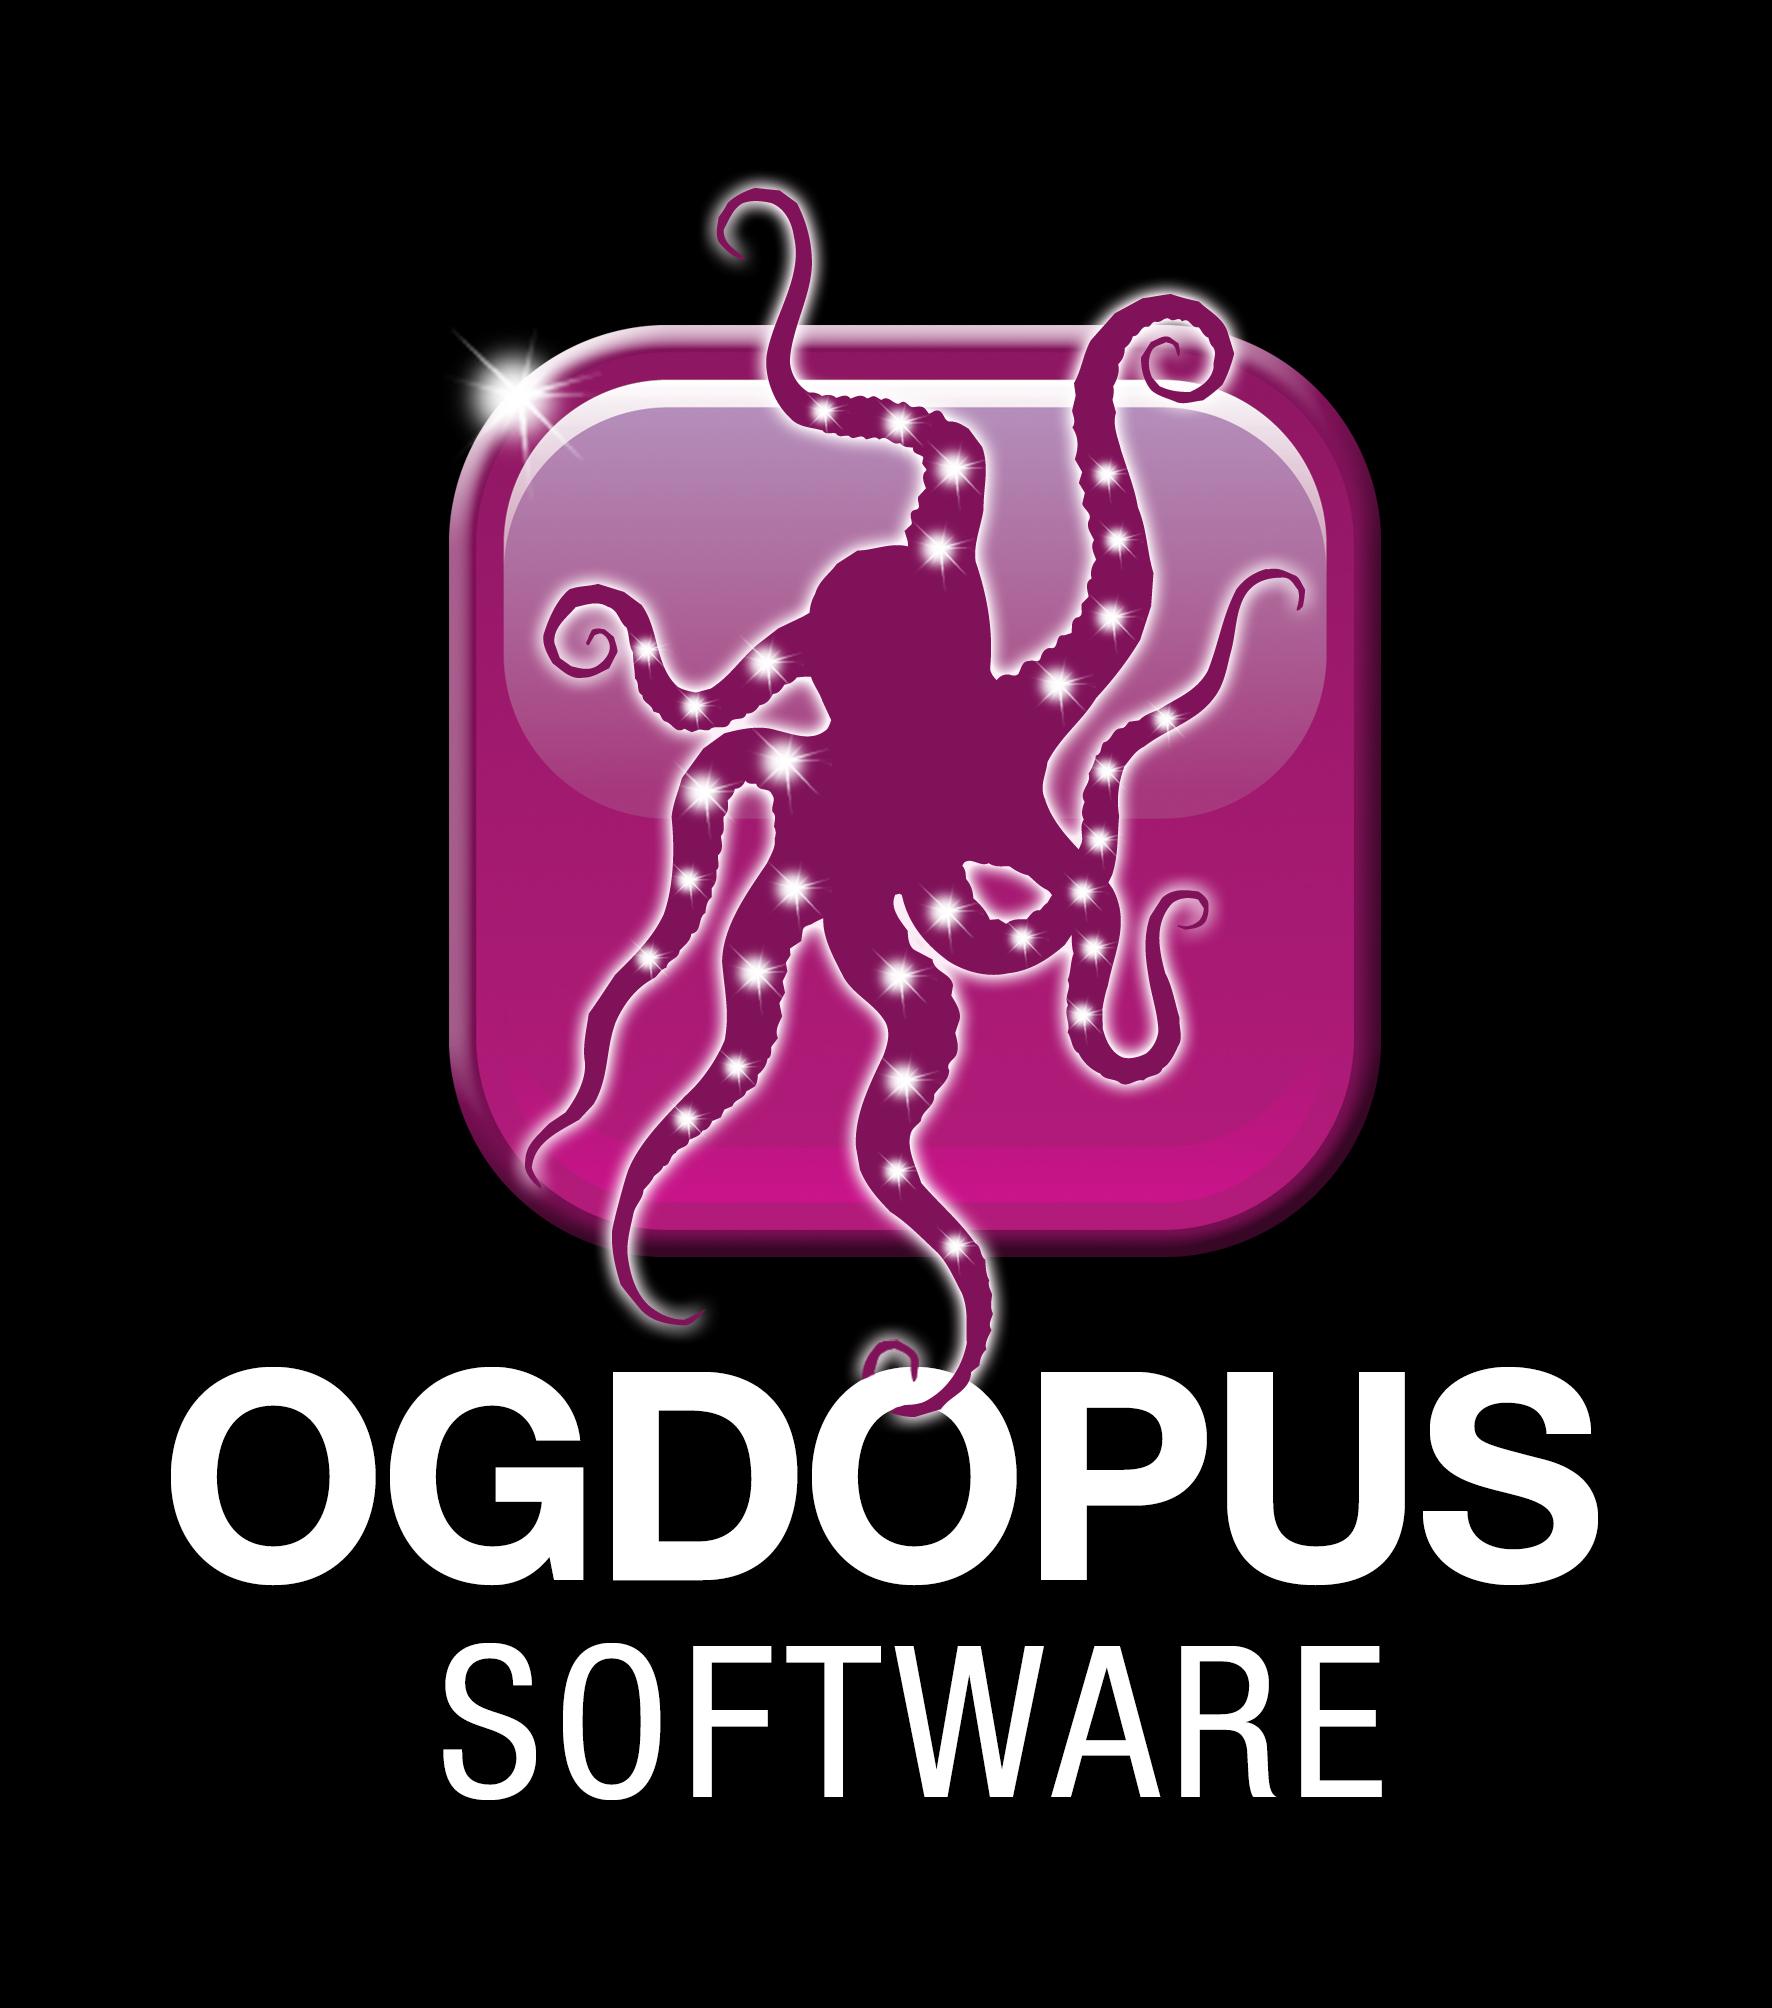 Ogdopus logo